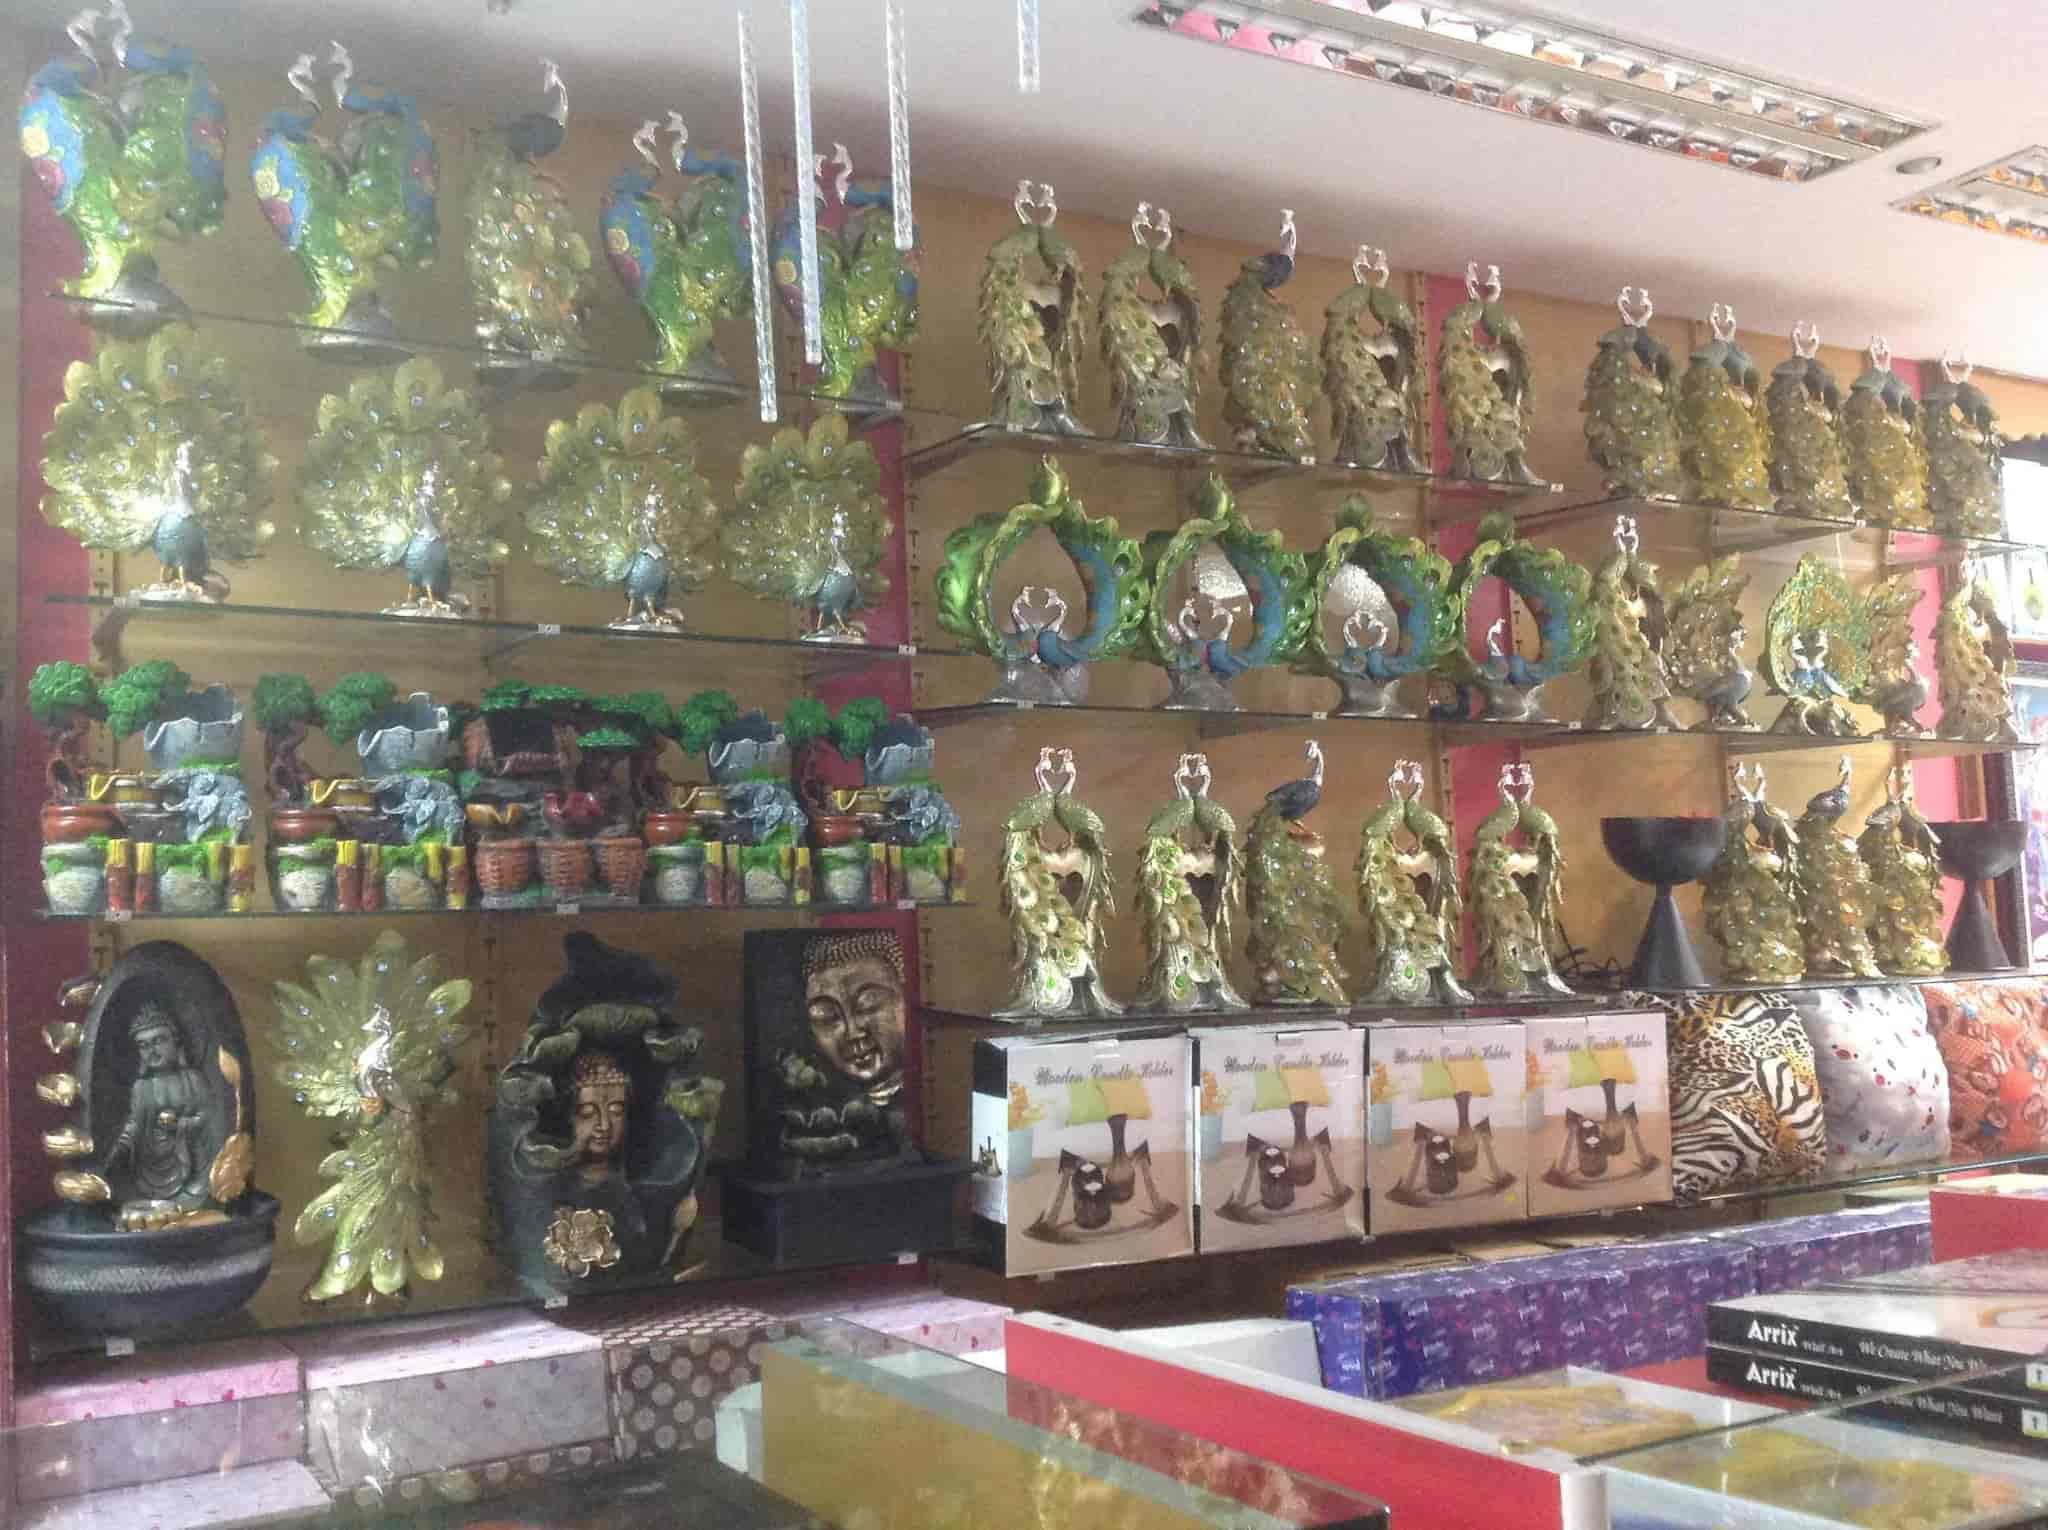 Prem's Gift Gallery, Wilson Garden - Gift Shops in Bangalore - Justdial